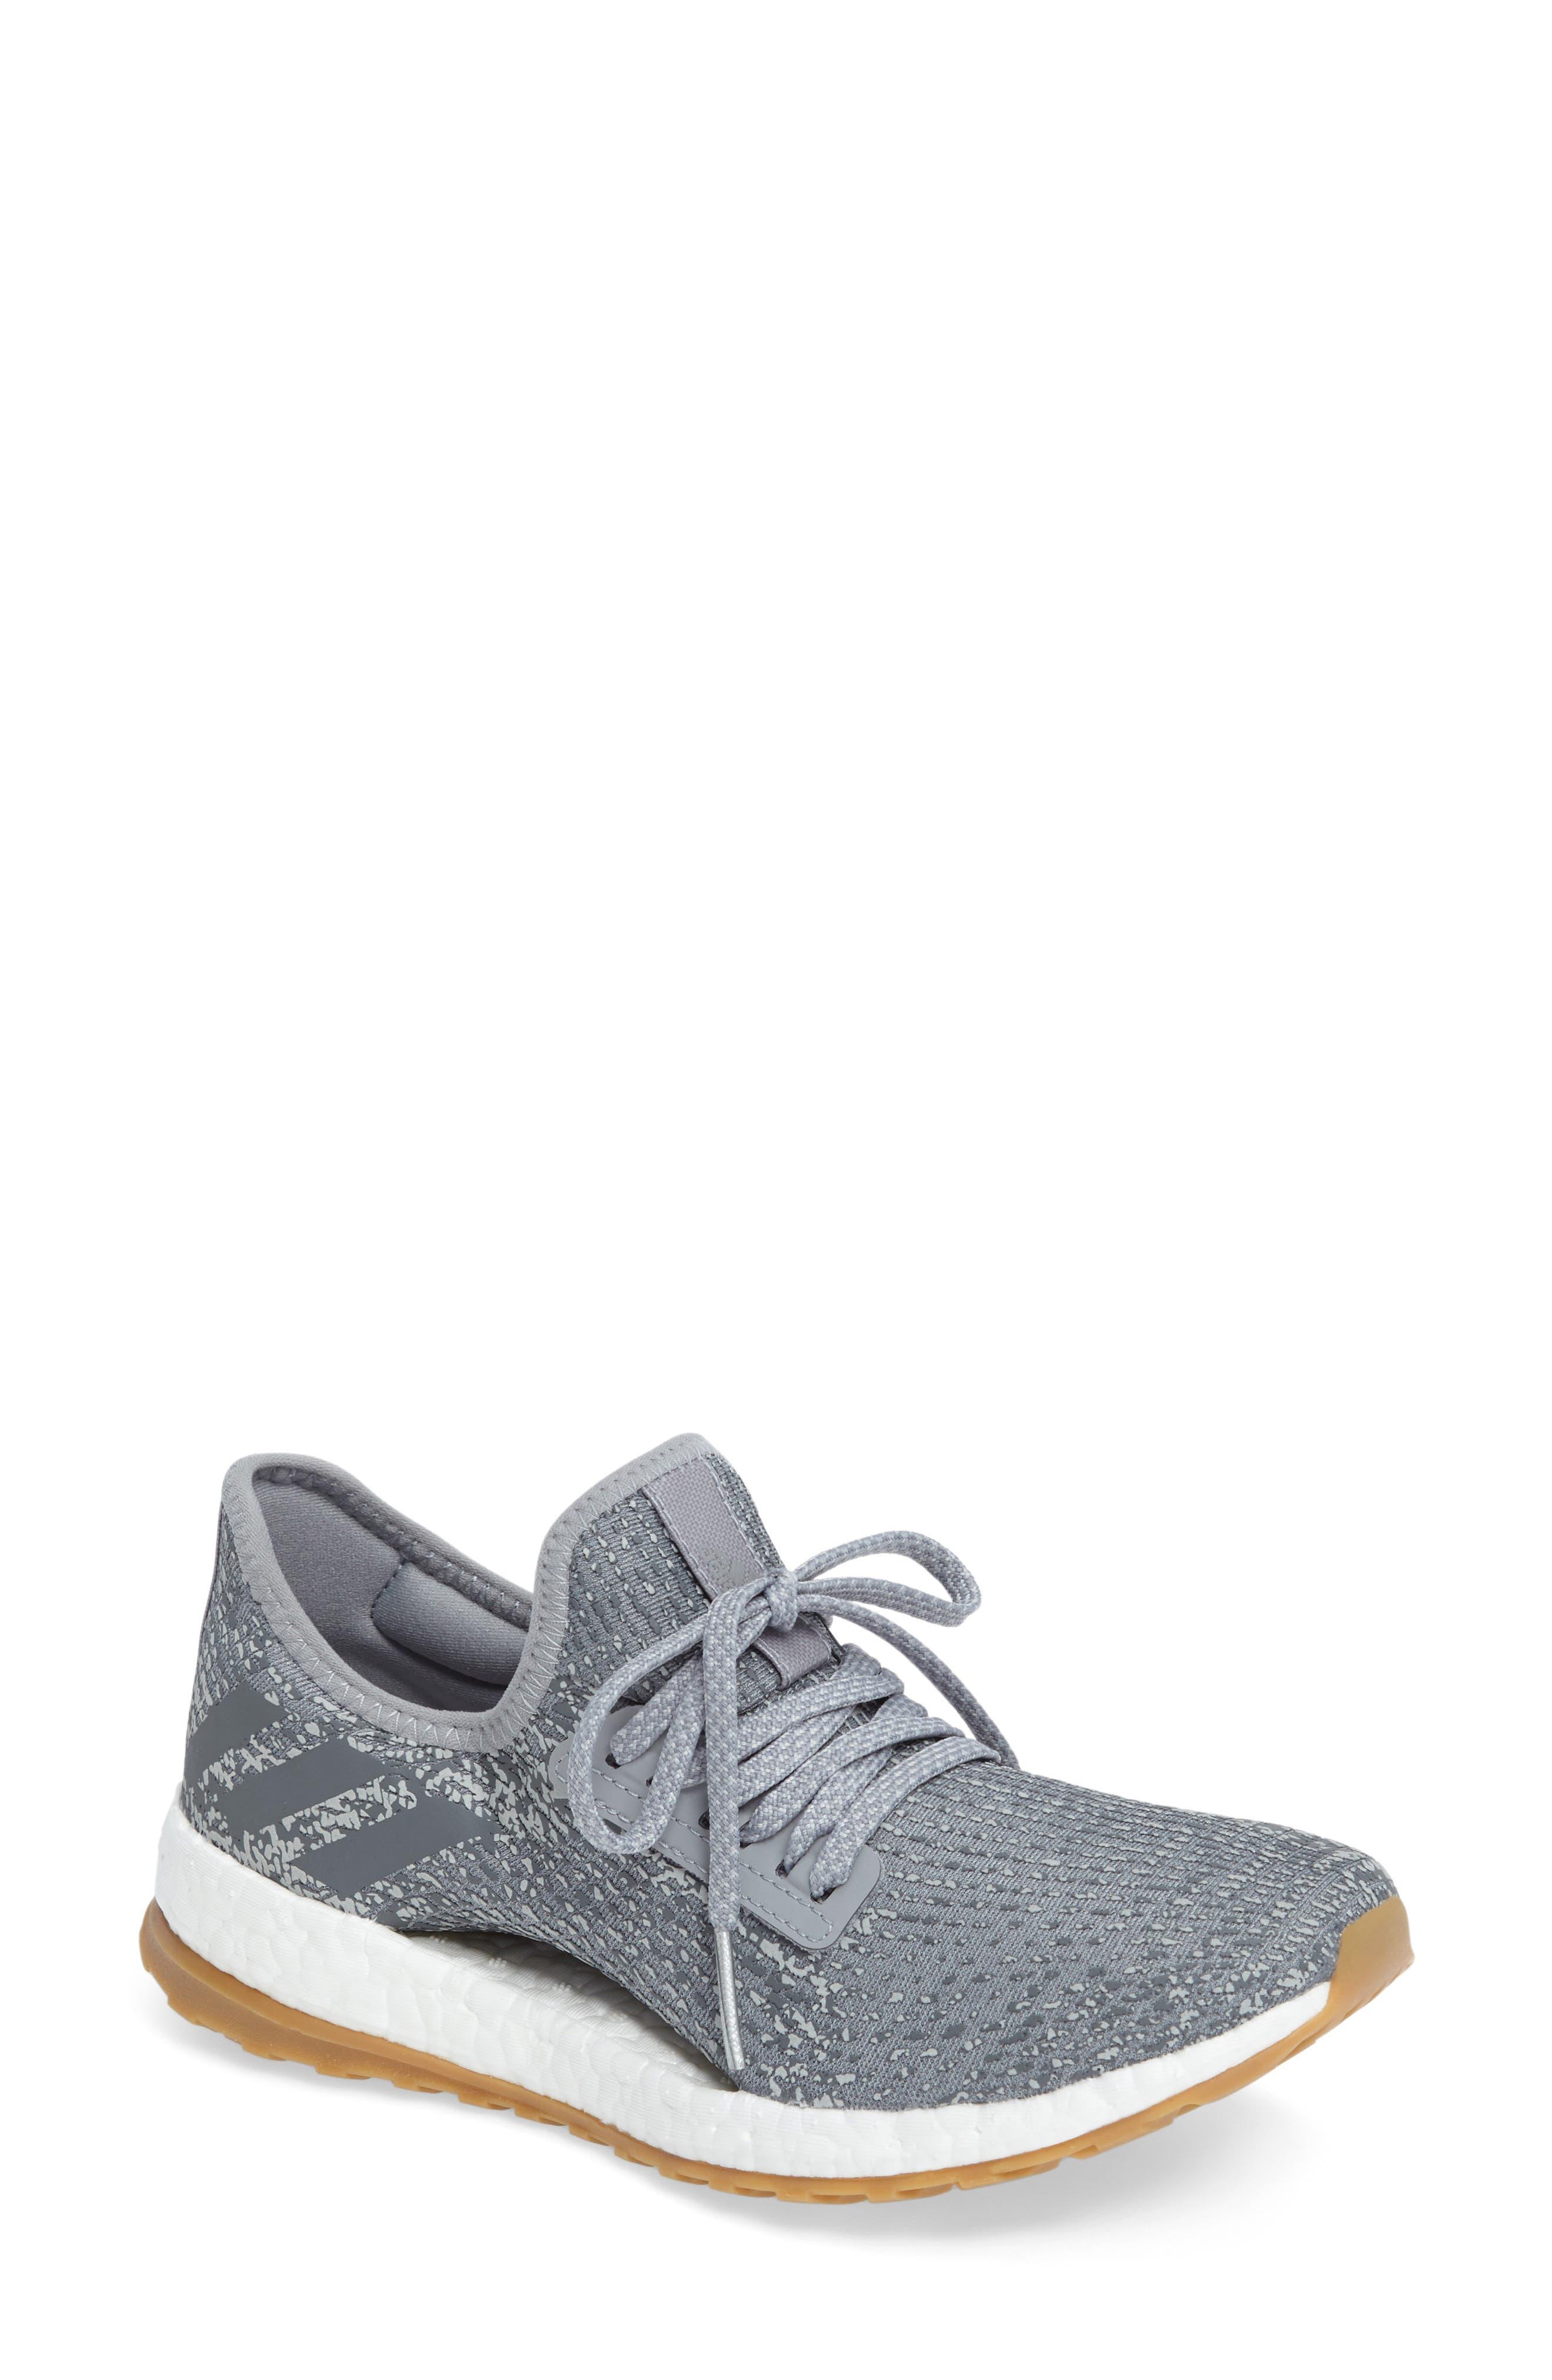 PureBoost X ATR Running Shoe,                             Main thumbnail 4, color,